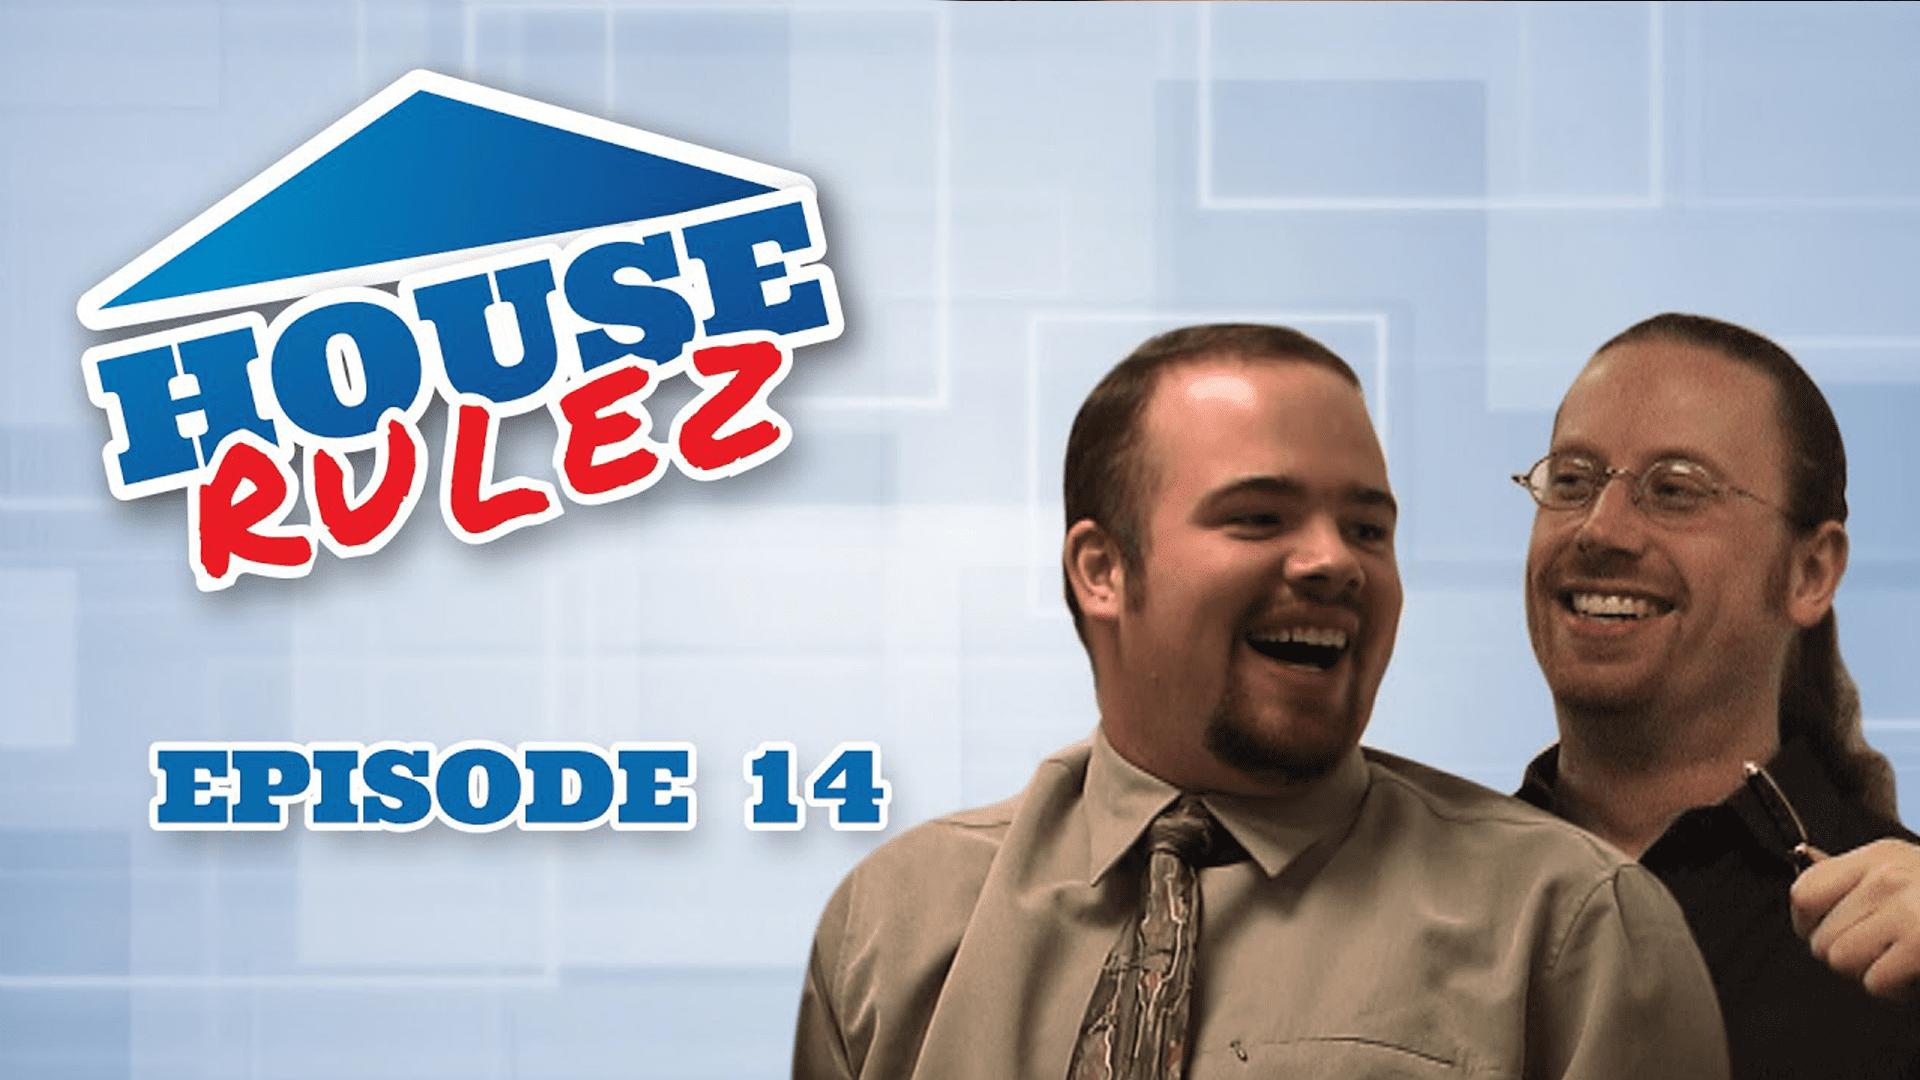 House Rulez Episode 14